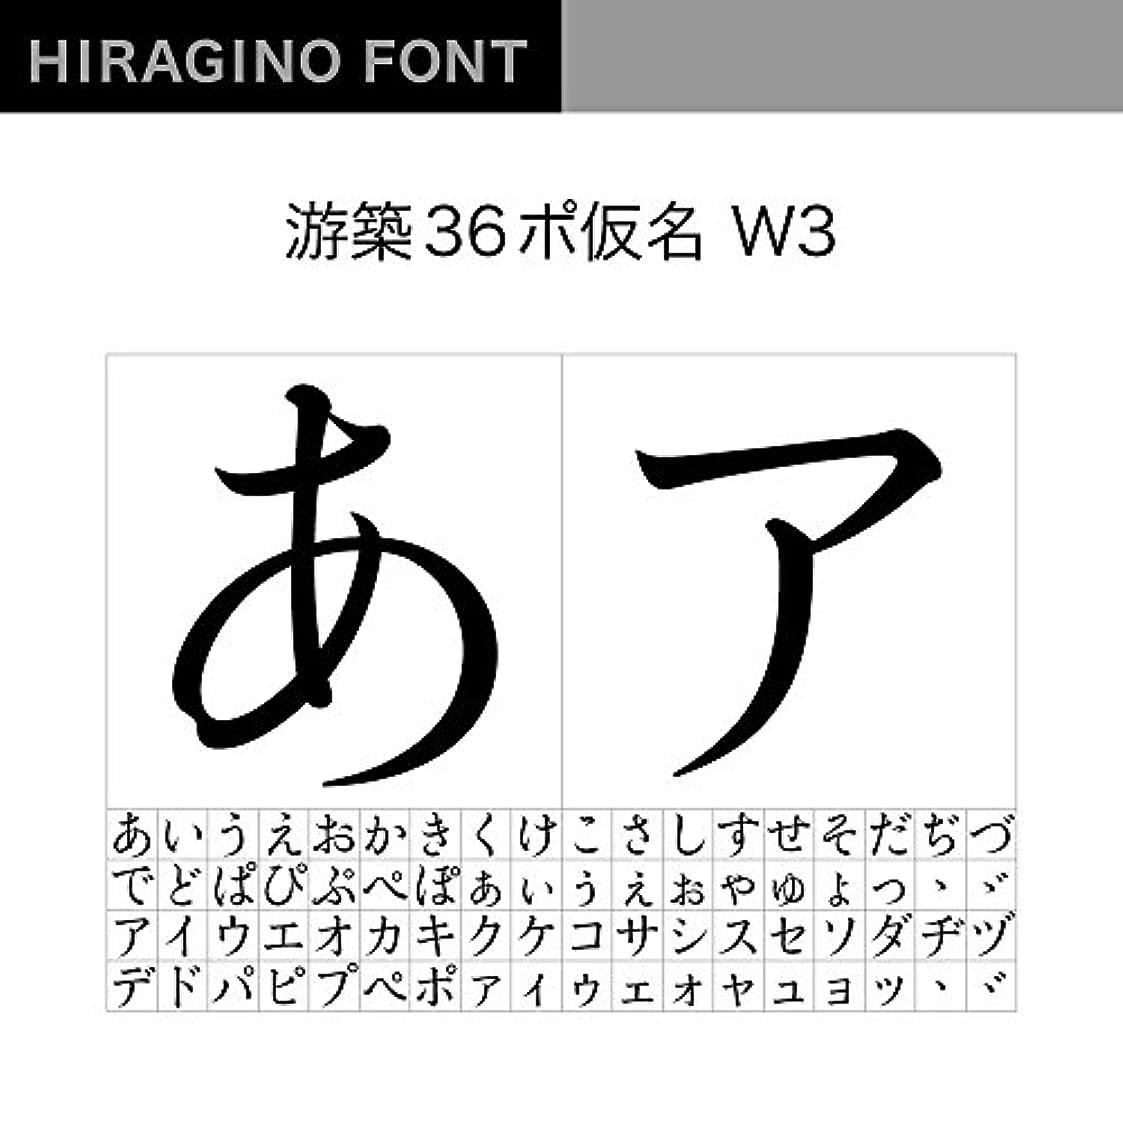 OpenType 游築36ポ仮名 W3 [ダウンロード]